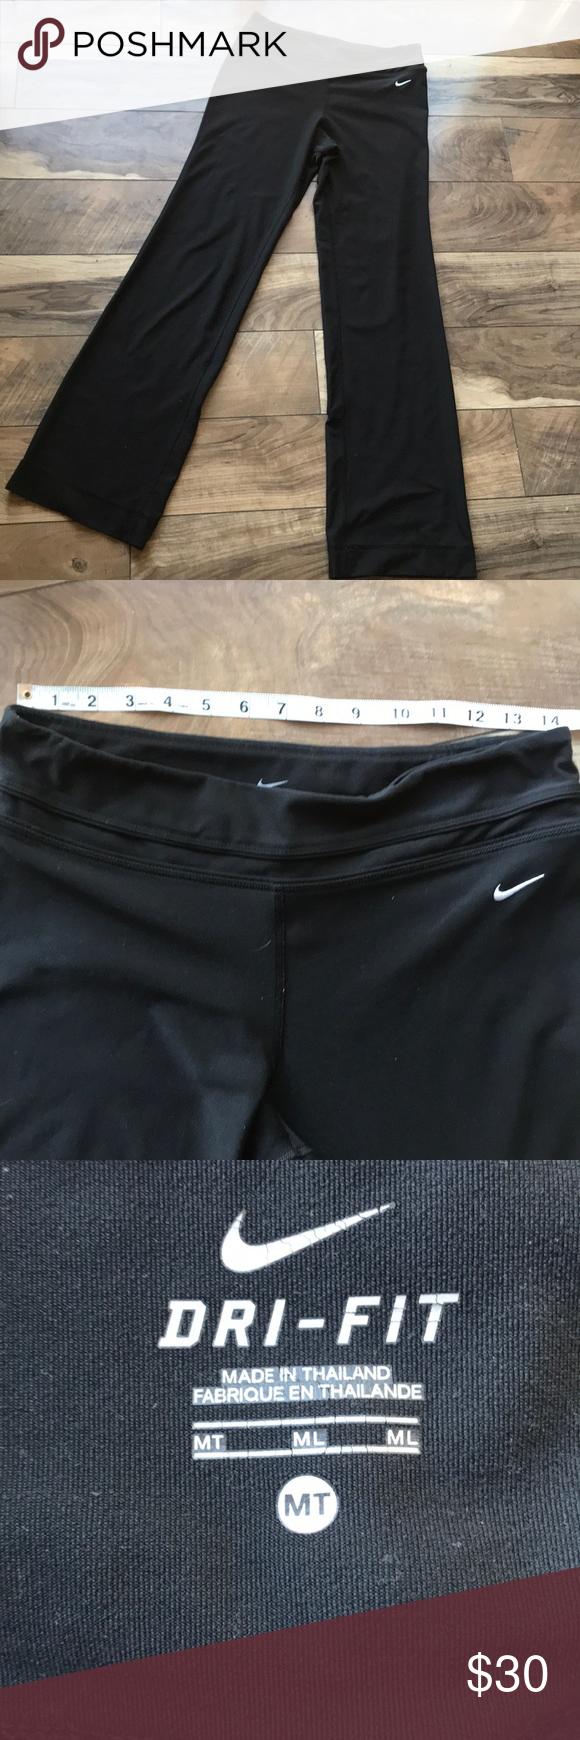 Nike Dri Fit Lounge Pants Medium Tall